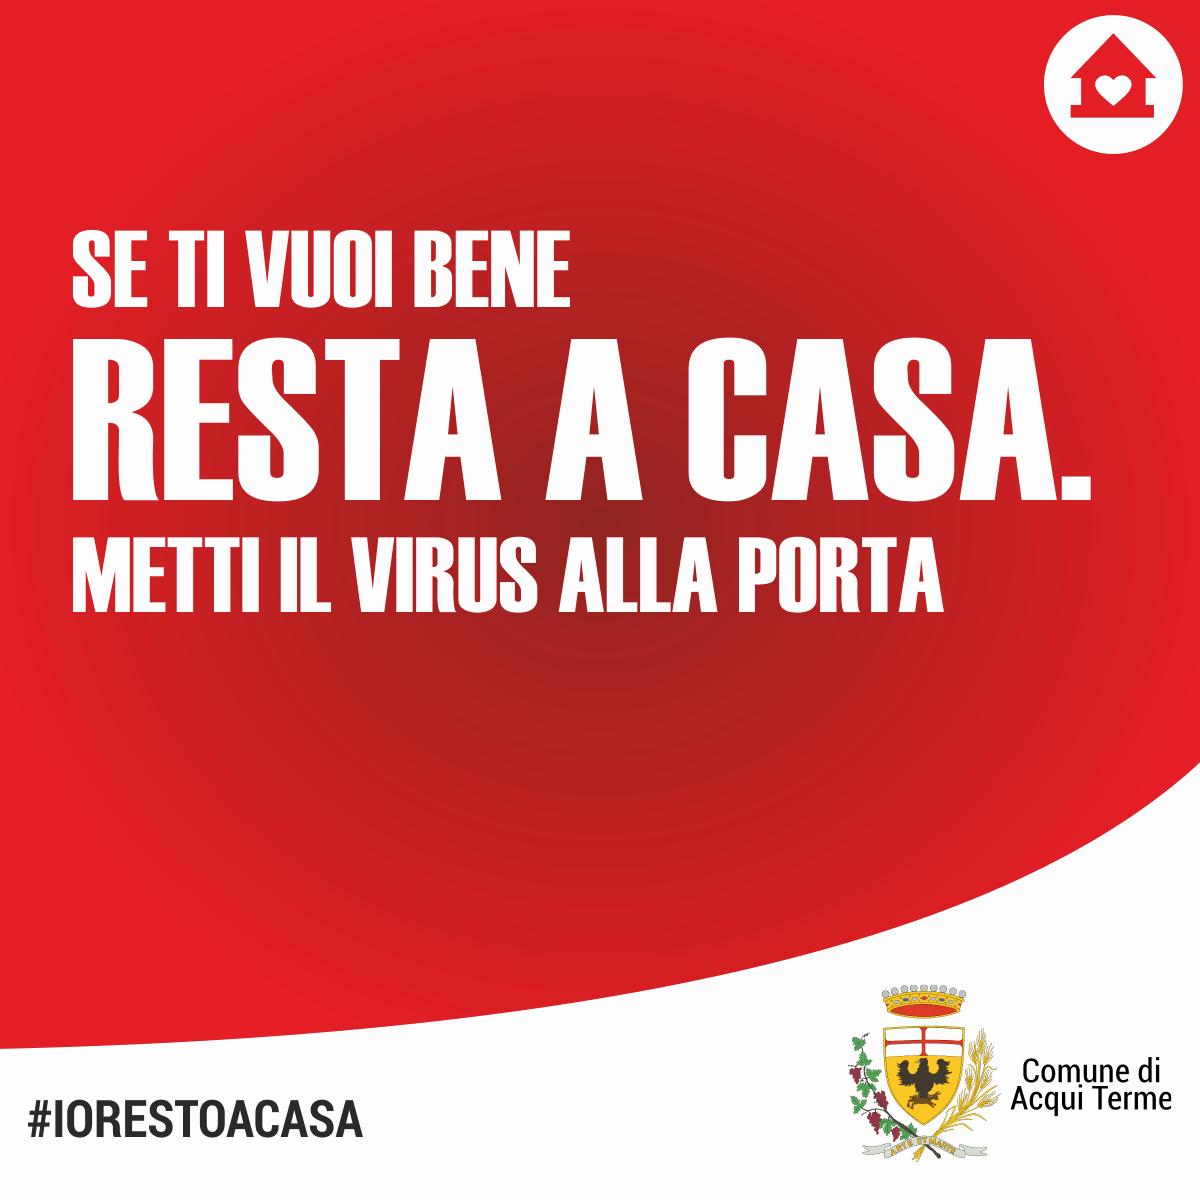 Postcard 1 - #iorestoacasa